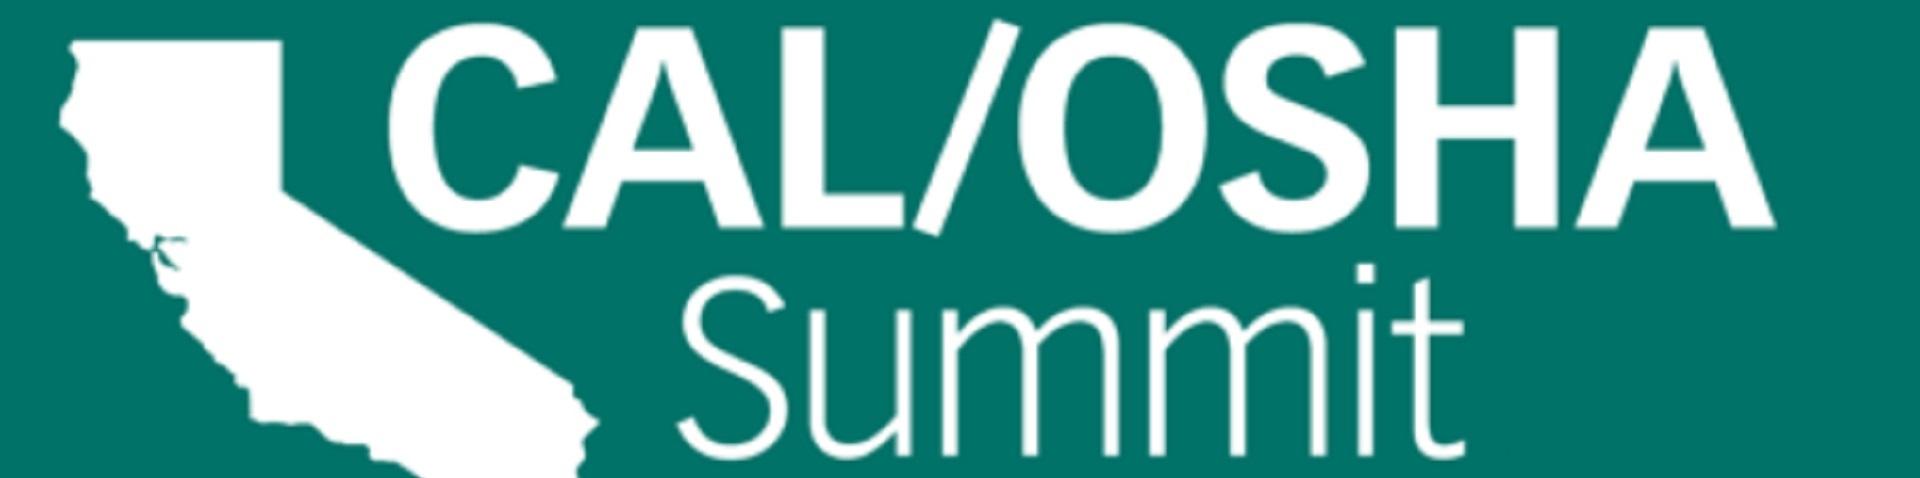 Cal/OSHA Summit